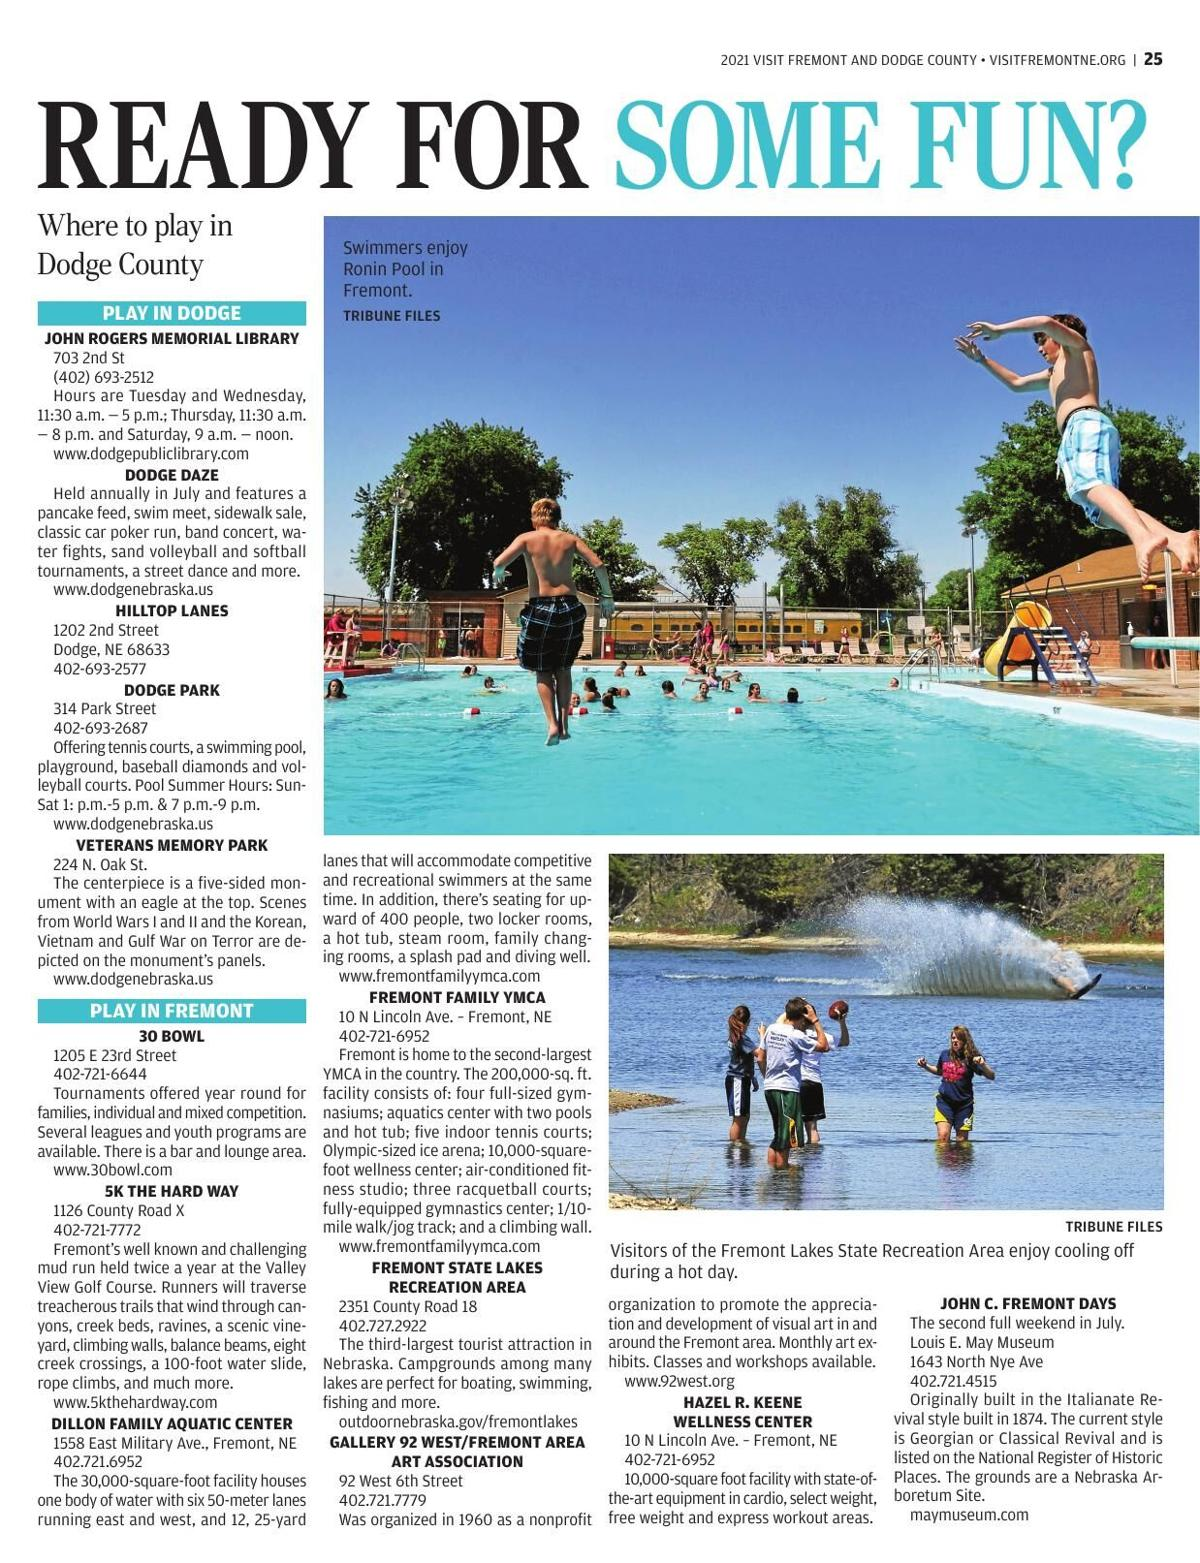 Visit Fremont and Dodge County 2021 25.pdf